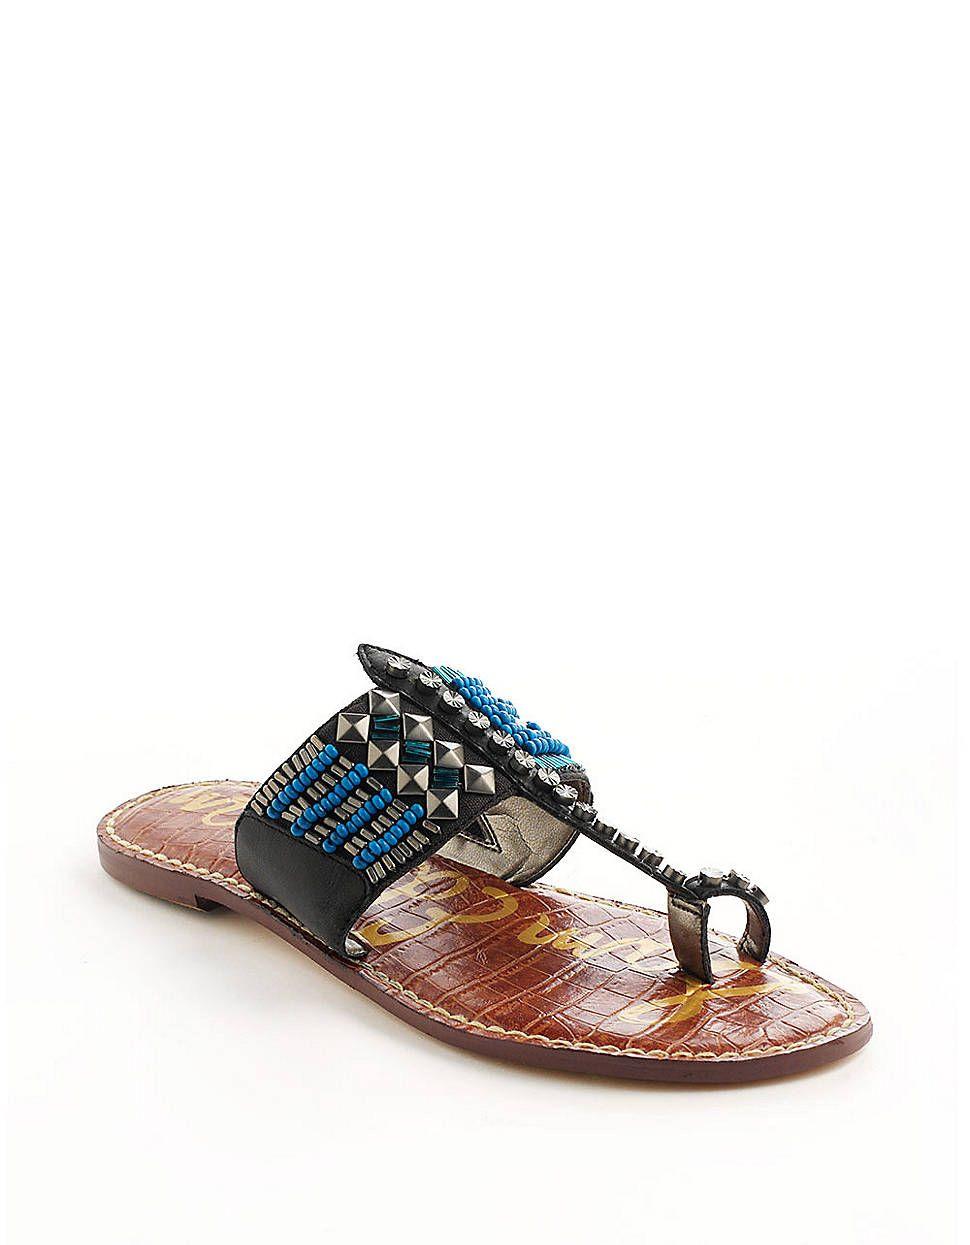 SAM EDELMANGideon Leather Beaded Sandals! #lordandtaylor